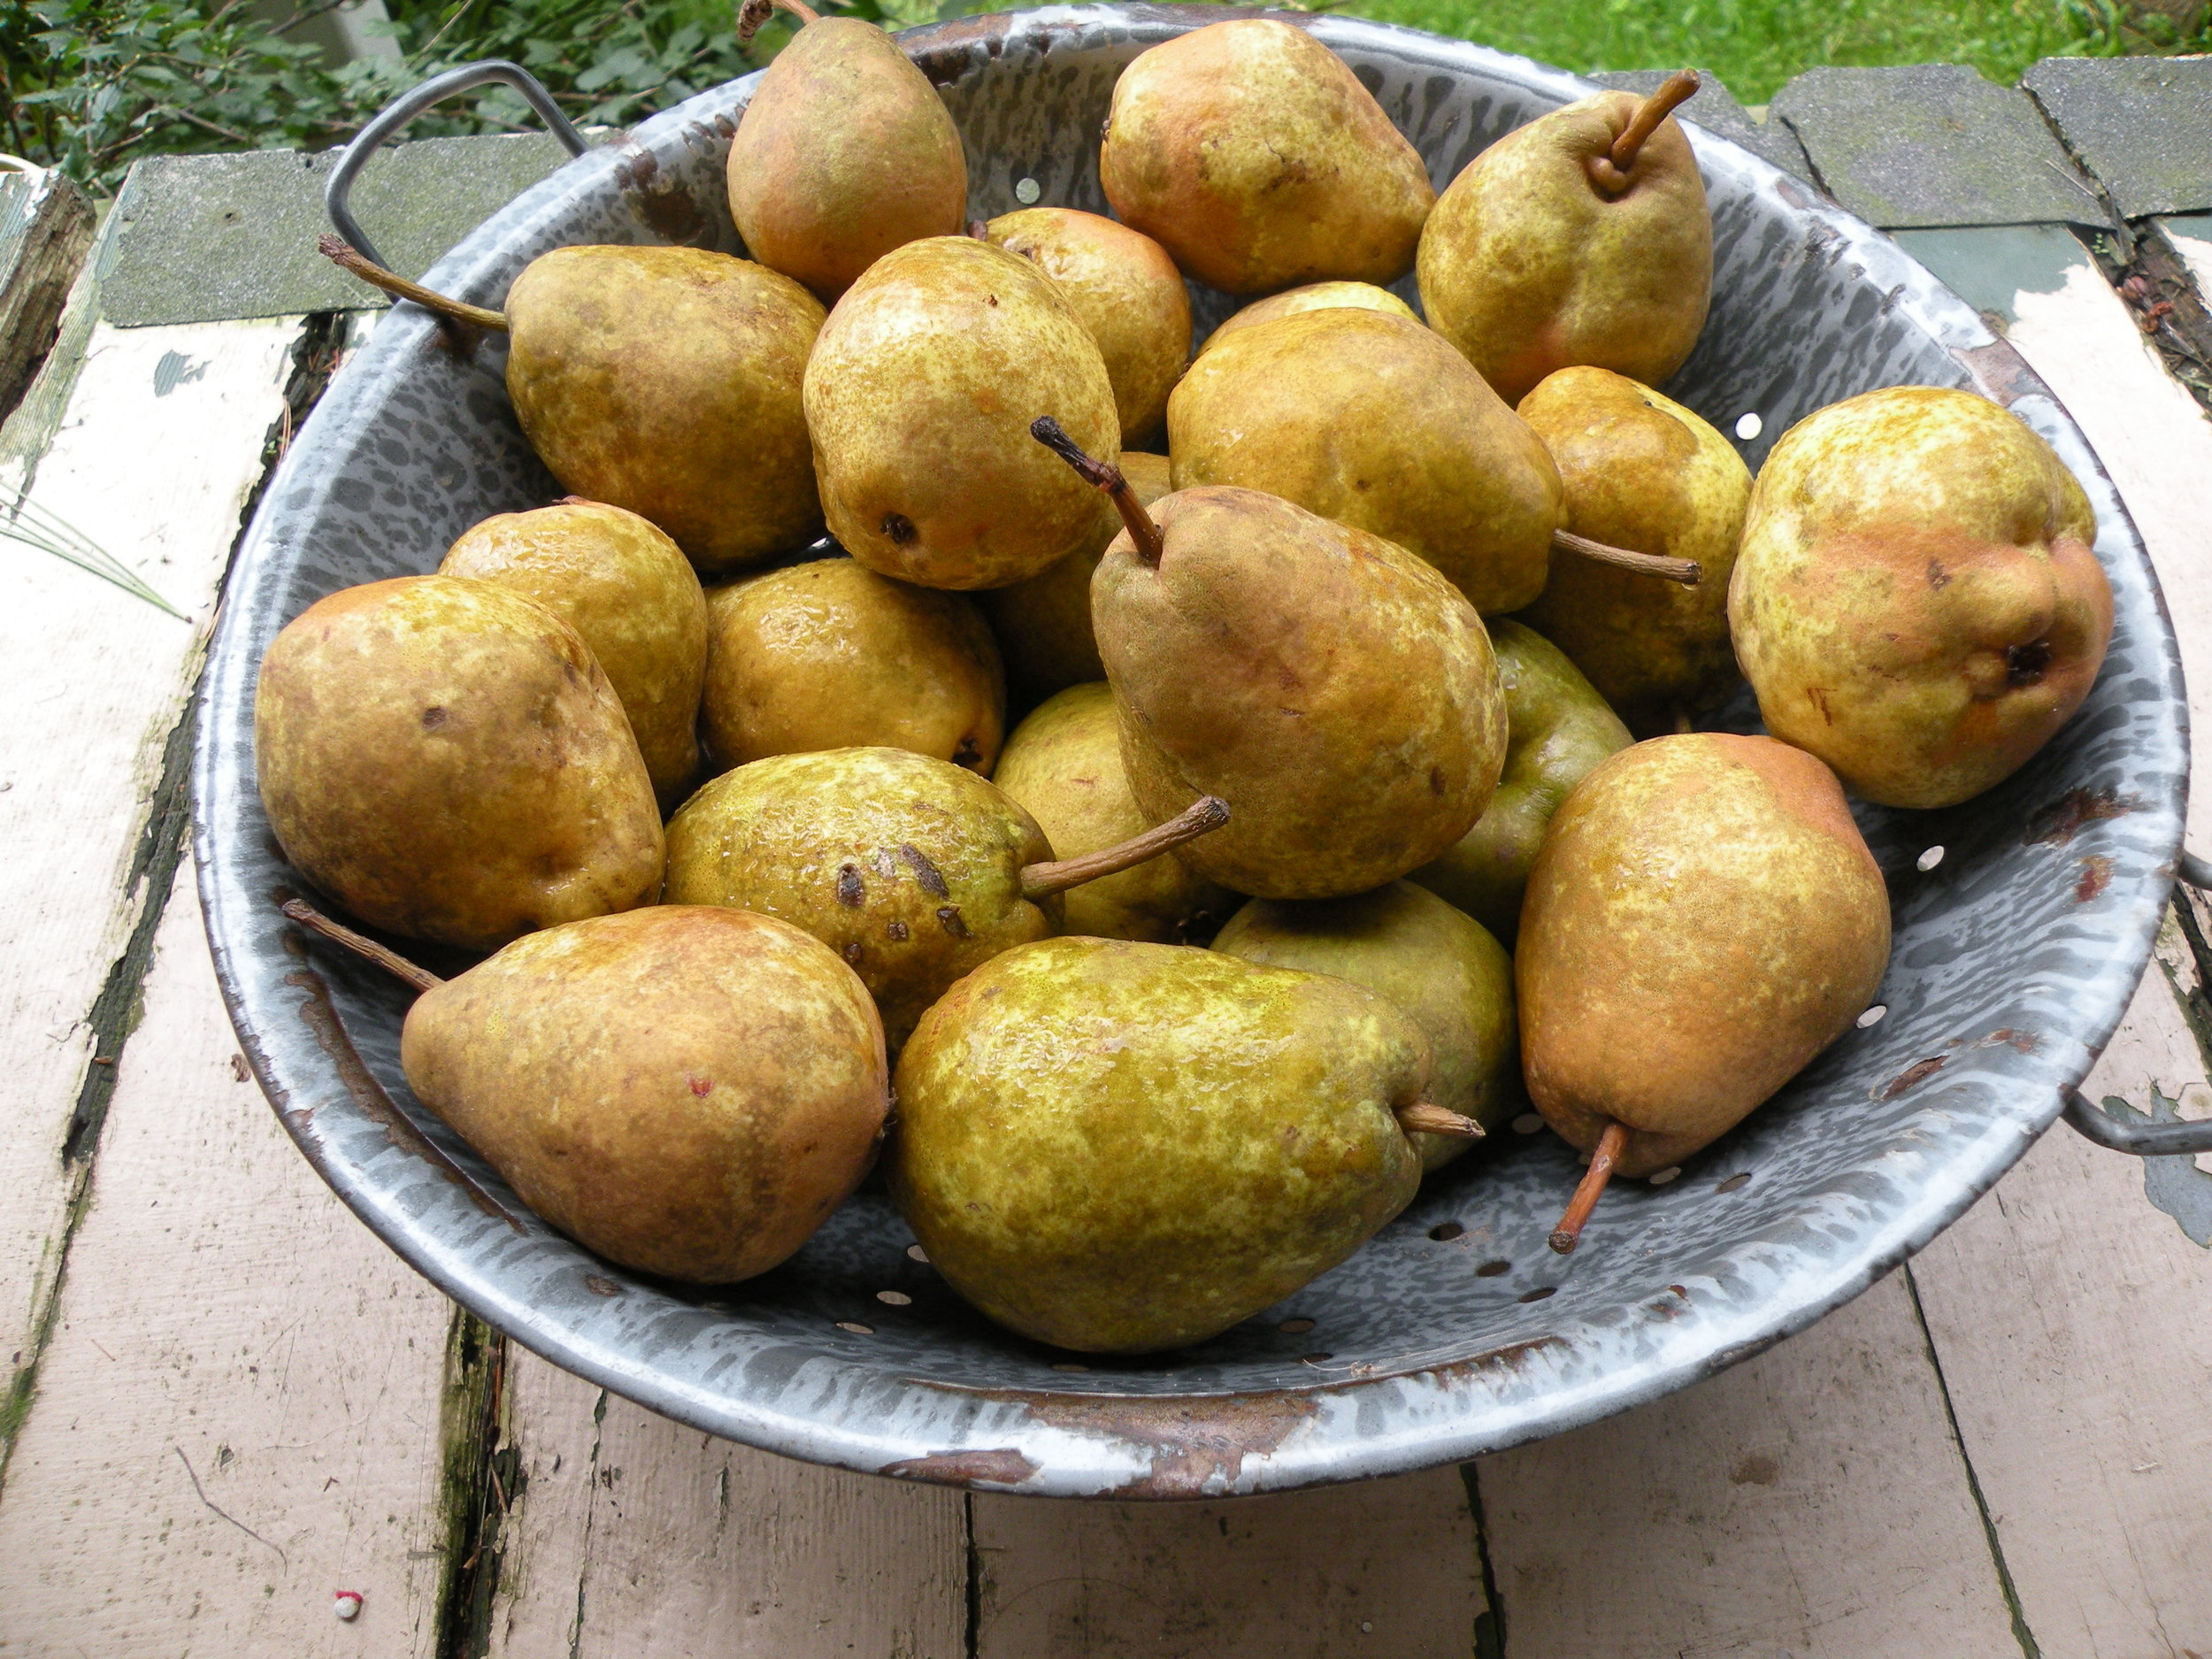 Ripe Clapp's Favorite Pears